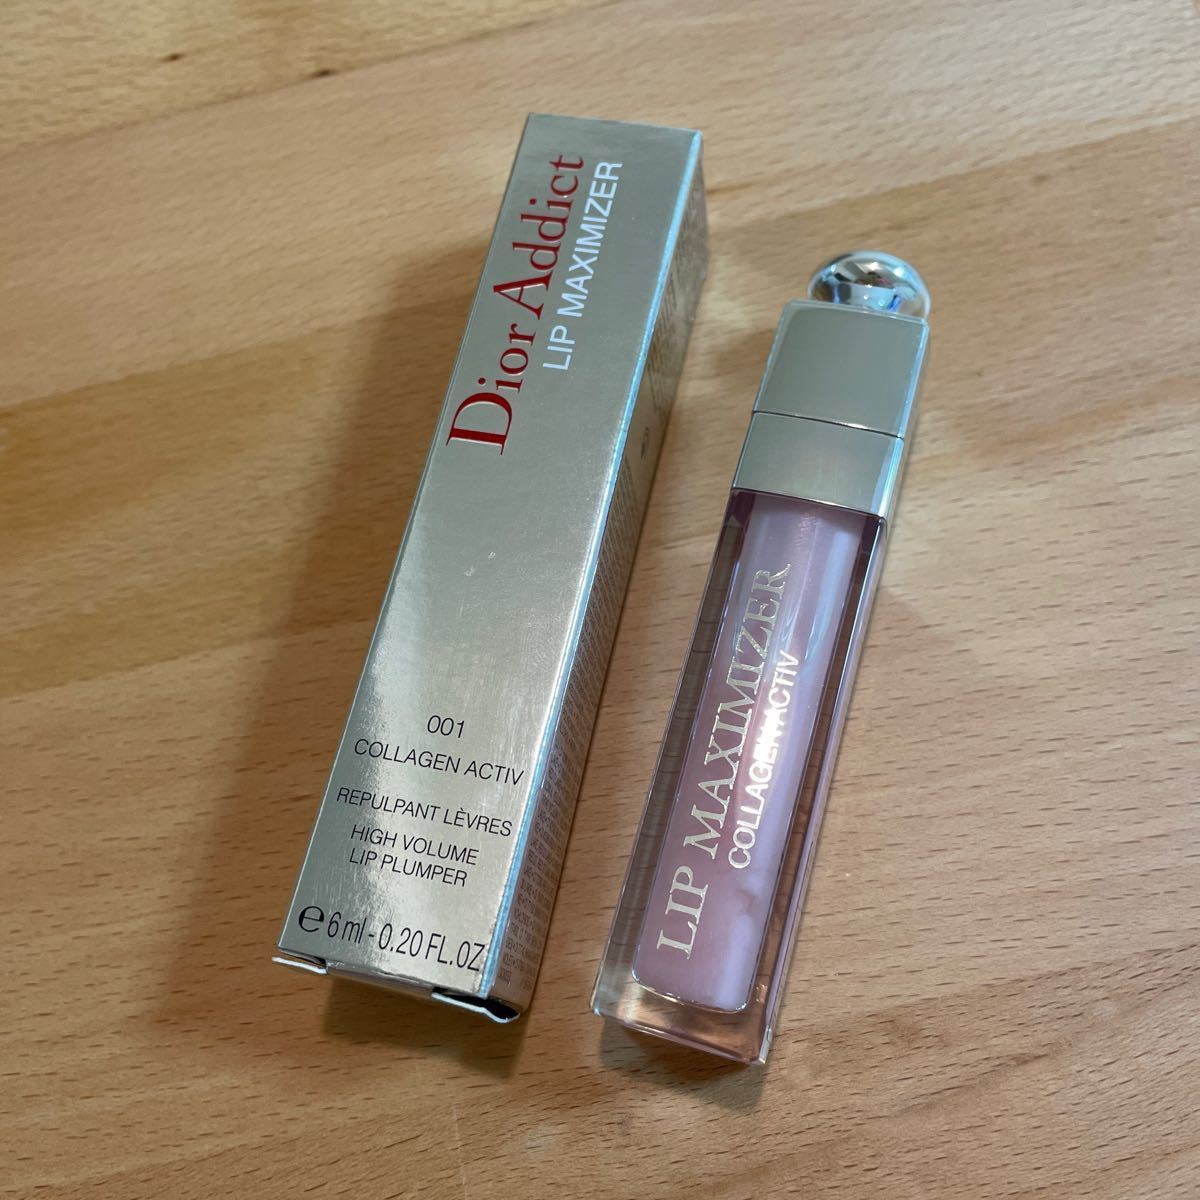 【Dior】正規品 ディオール マキシマイザー 001 リップグロス 6ml